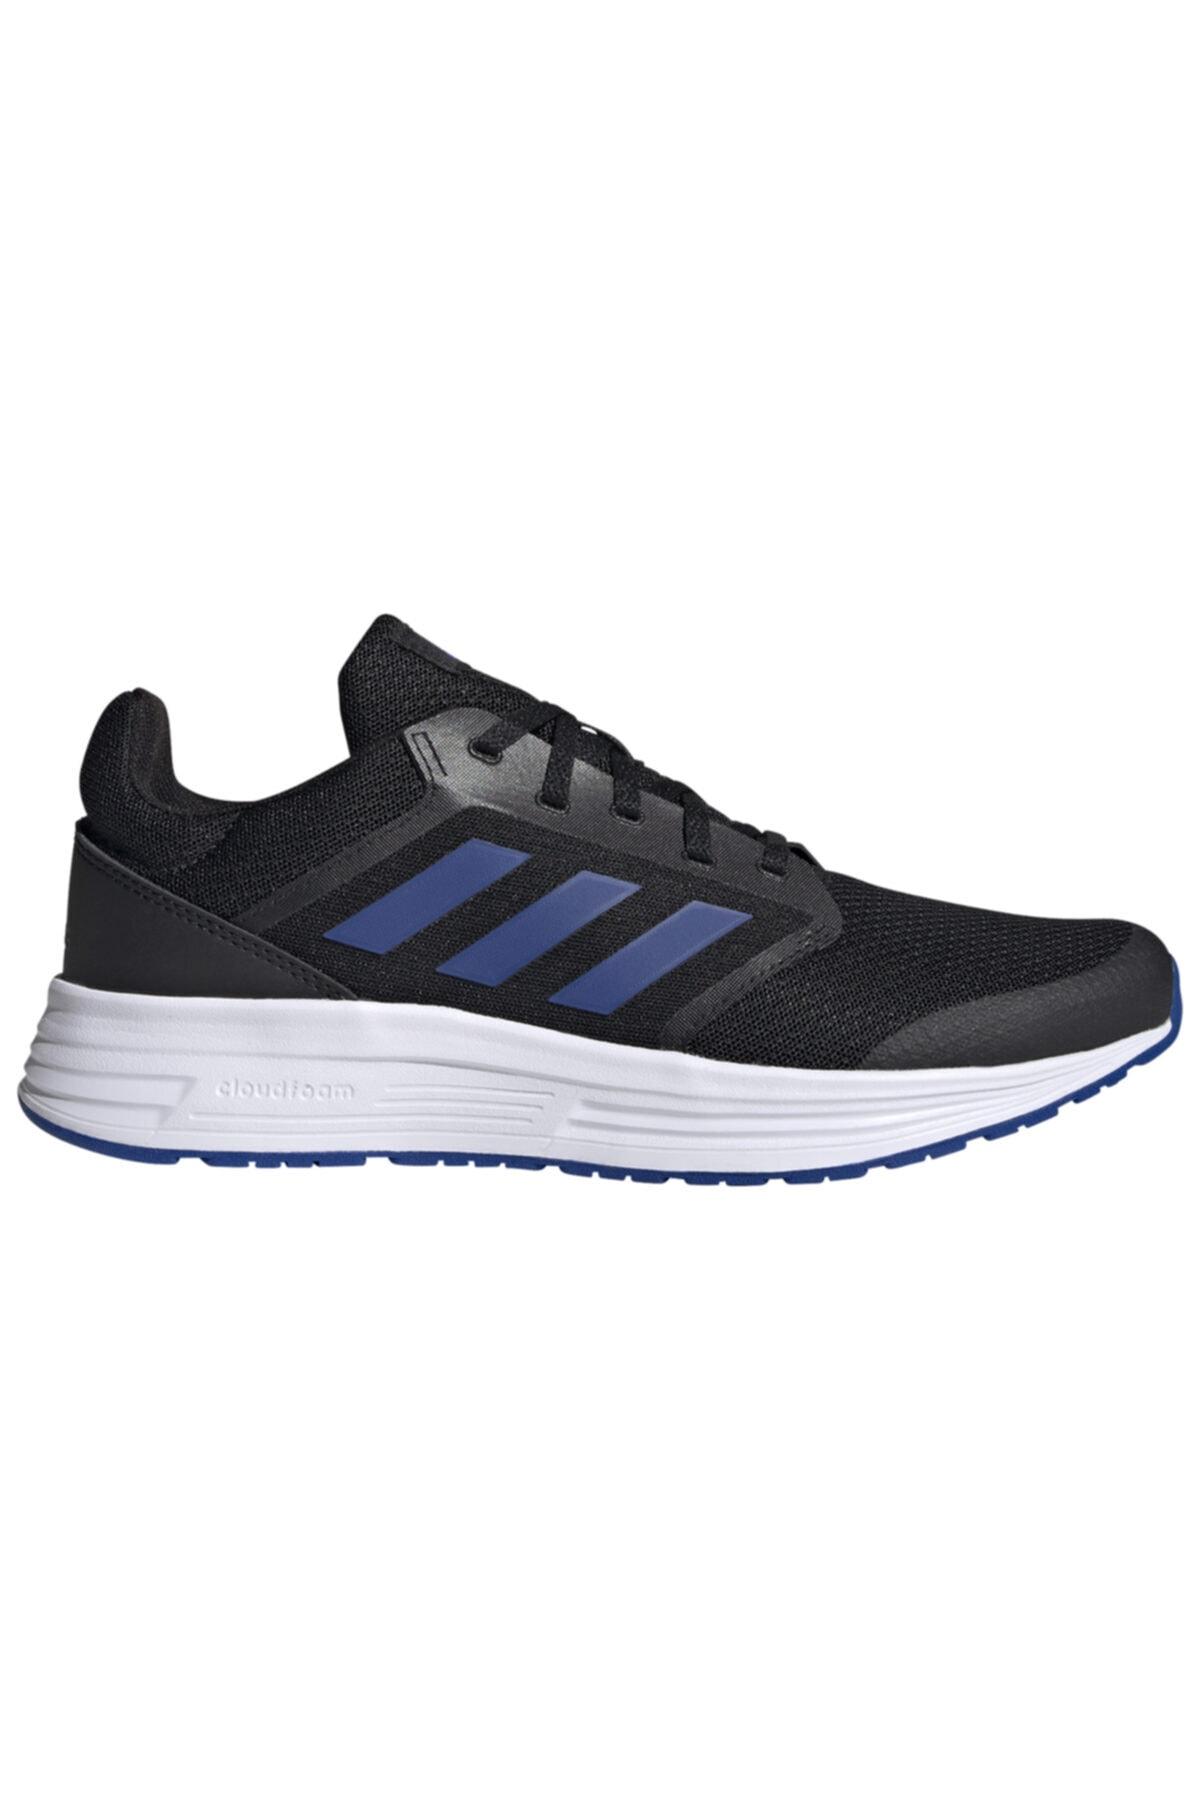 adidas GALAXY 5 Siyah Erkek Koşu Ayakkabısı 100663975 1